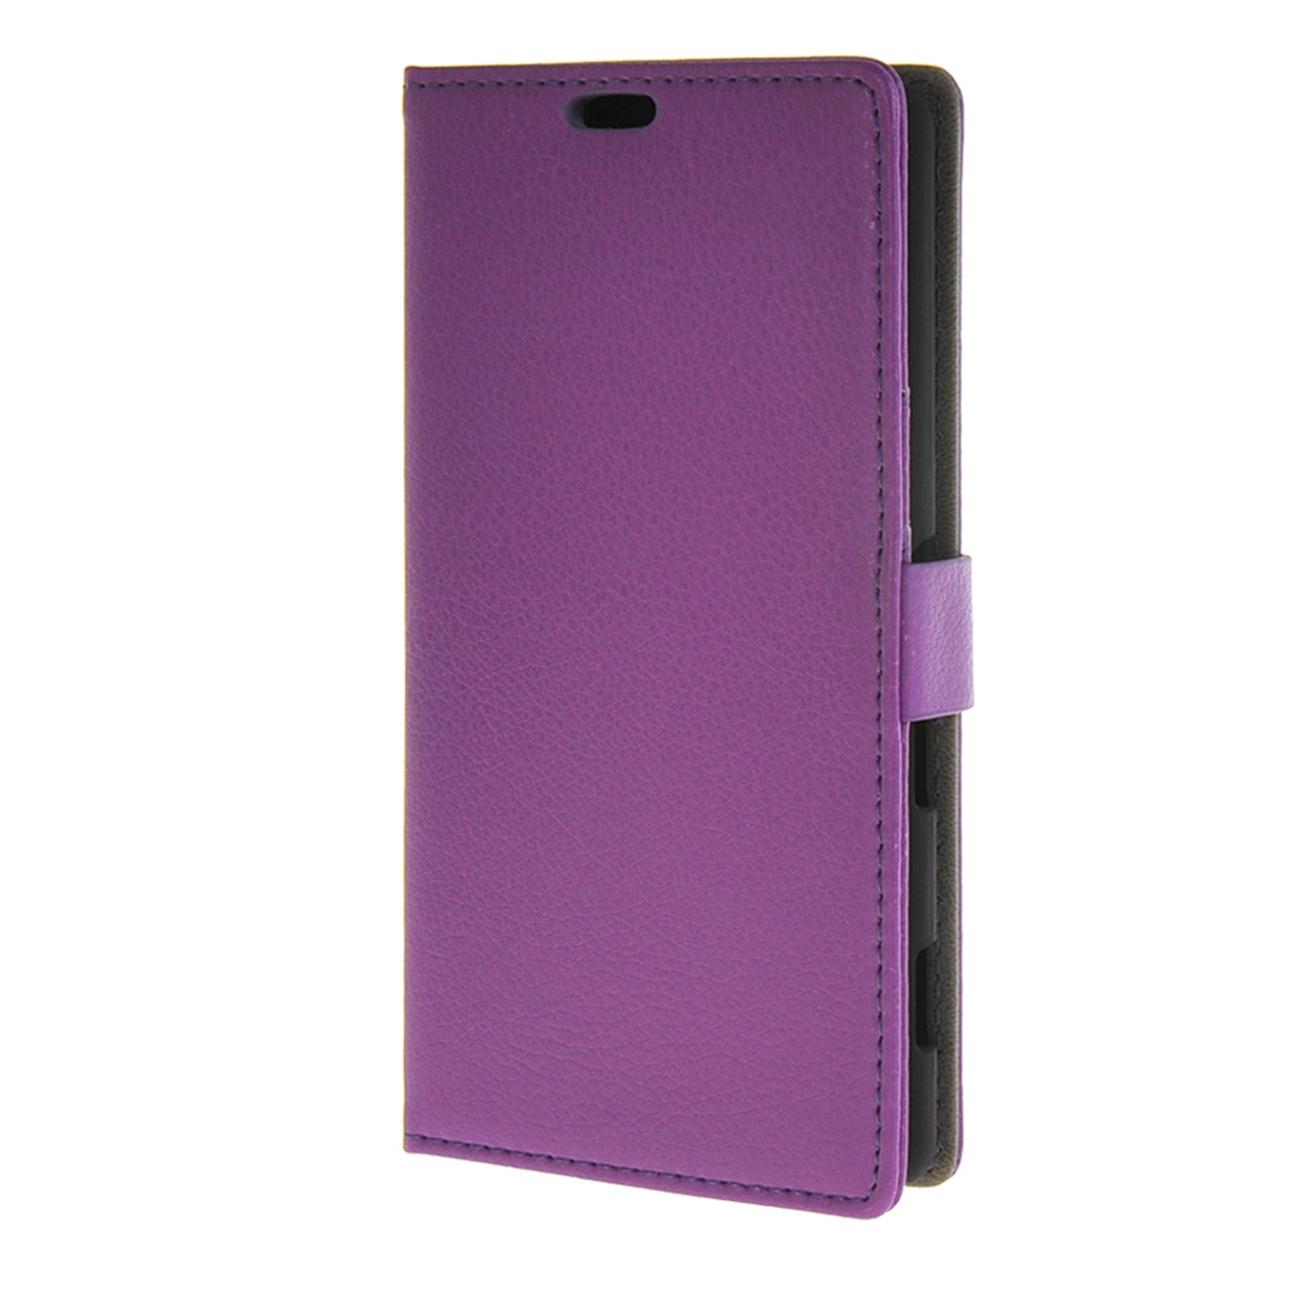 MOONCASE mooncase smooth pu leather flip wallet card slot bracket back чехол для sony xperia m4 aqua purple